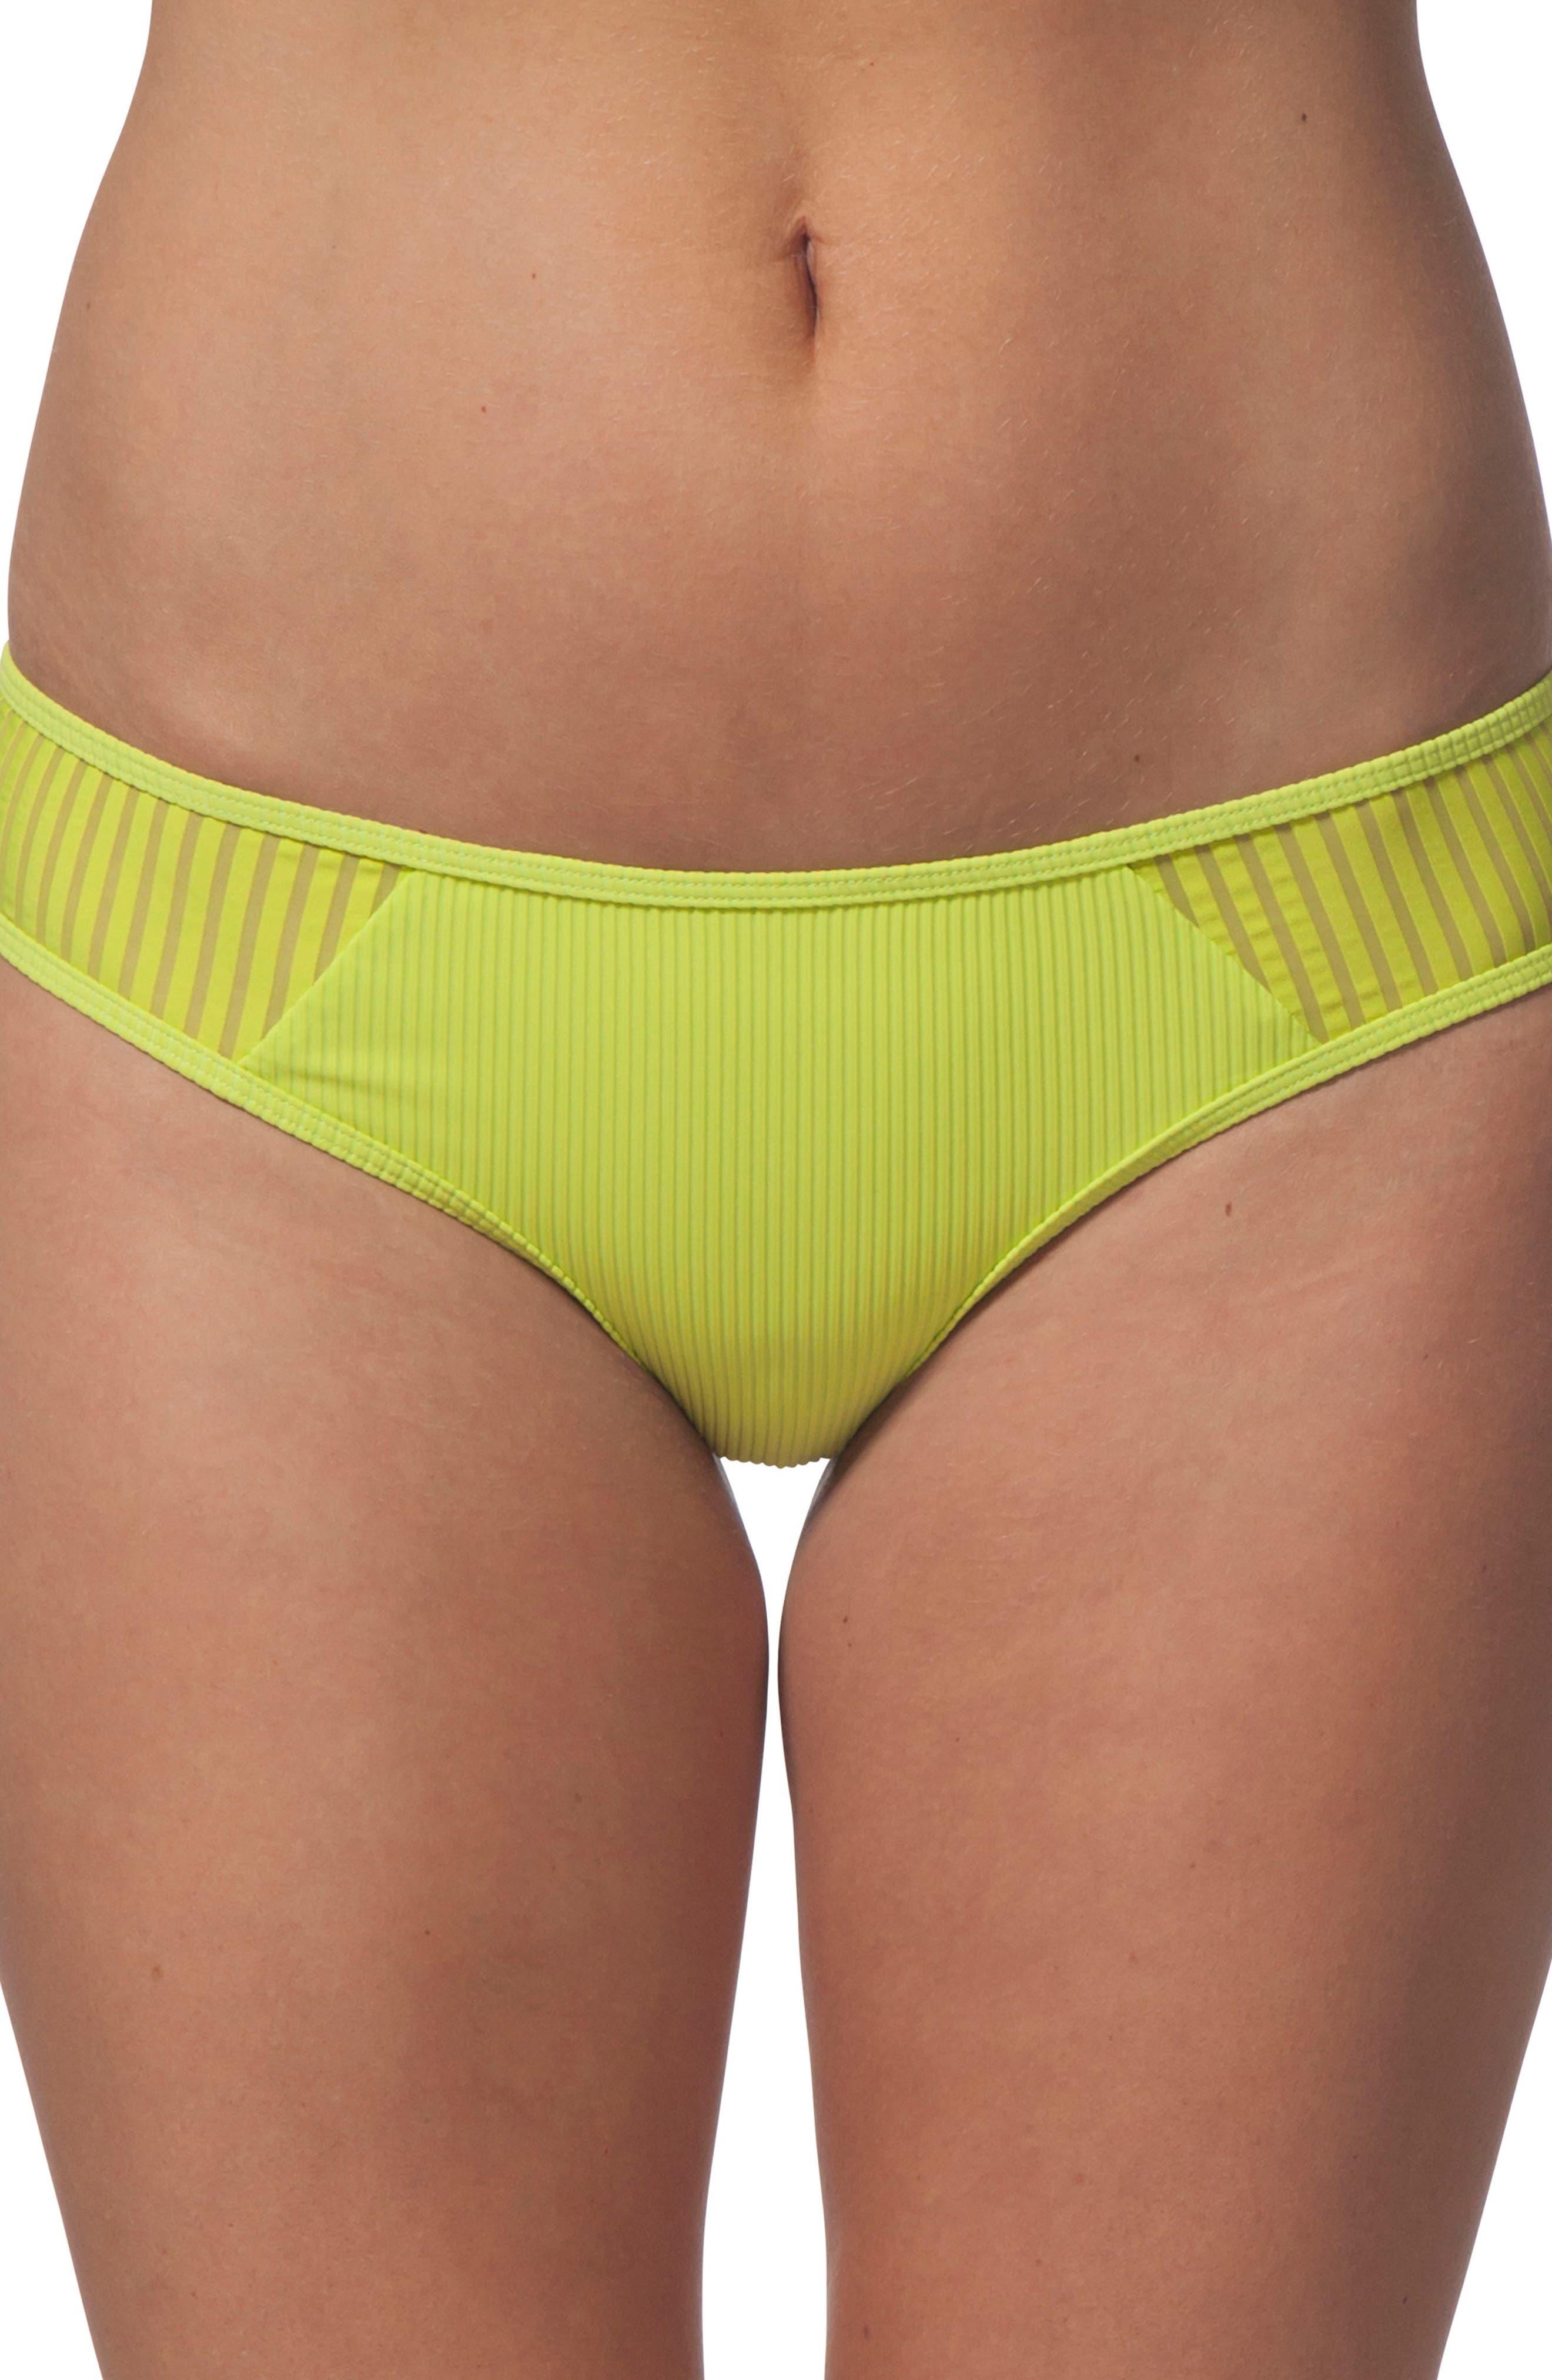 Designer Surf Hipster Bikini Bottoms,                         Main,                         color, Neon Lime